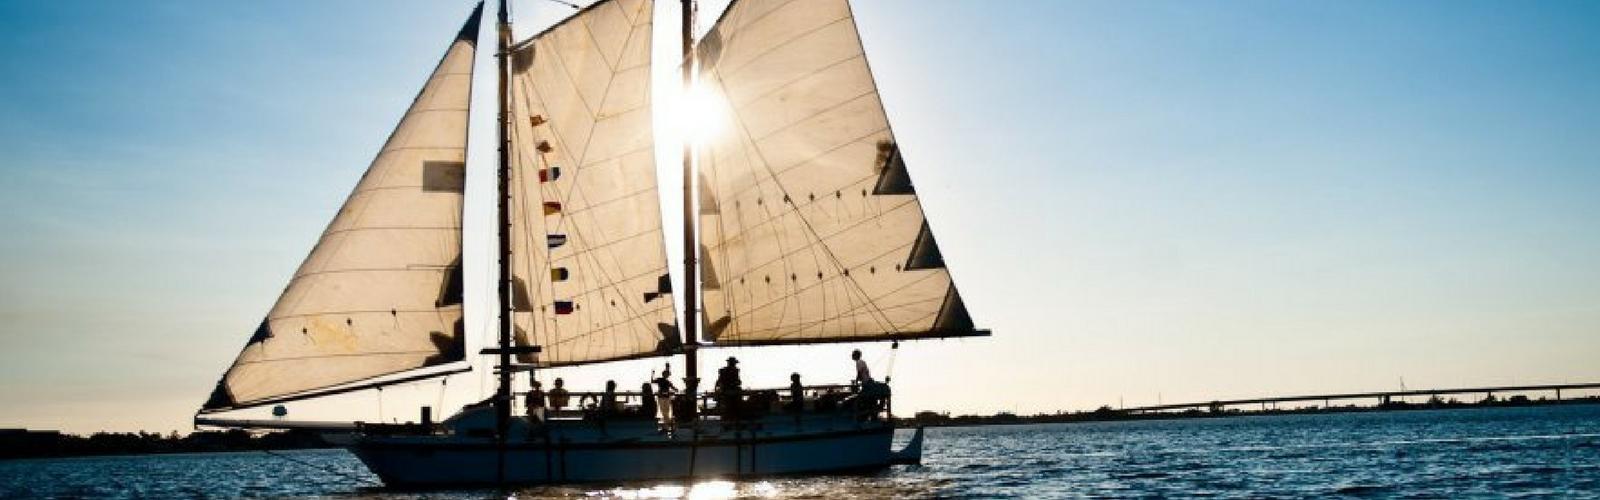 Must-Cruise Boat Tours on the Treasure Coast